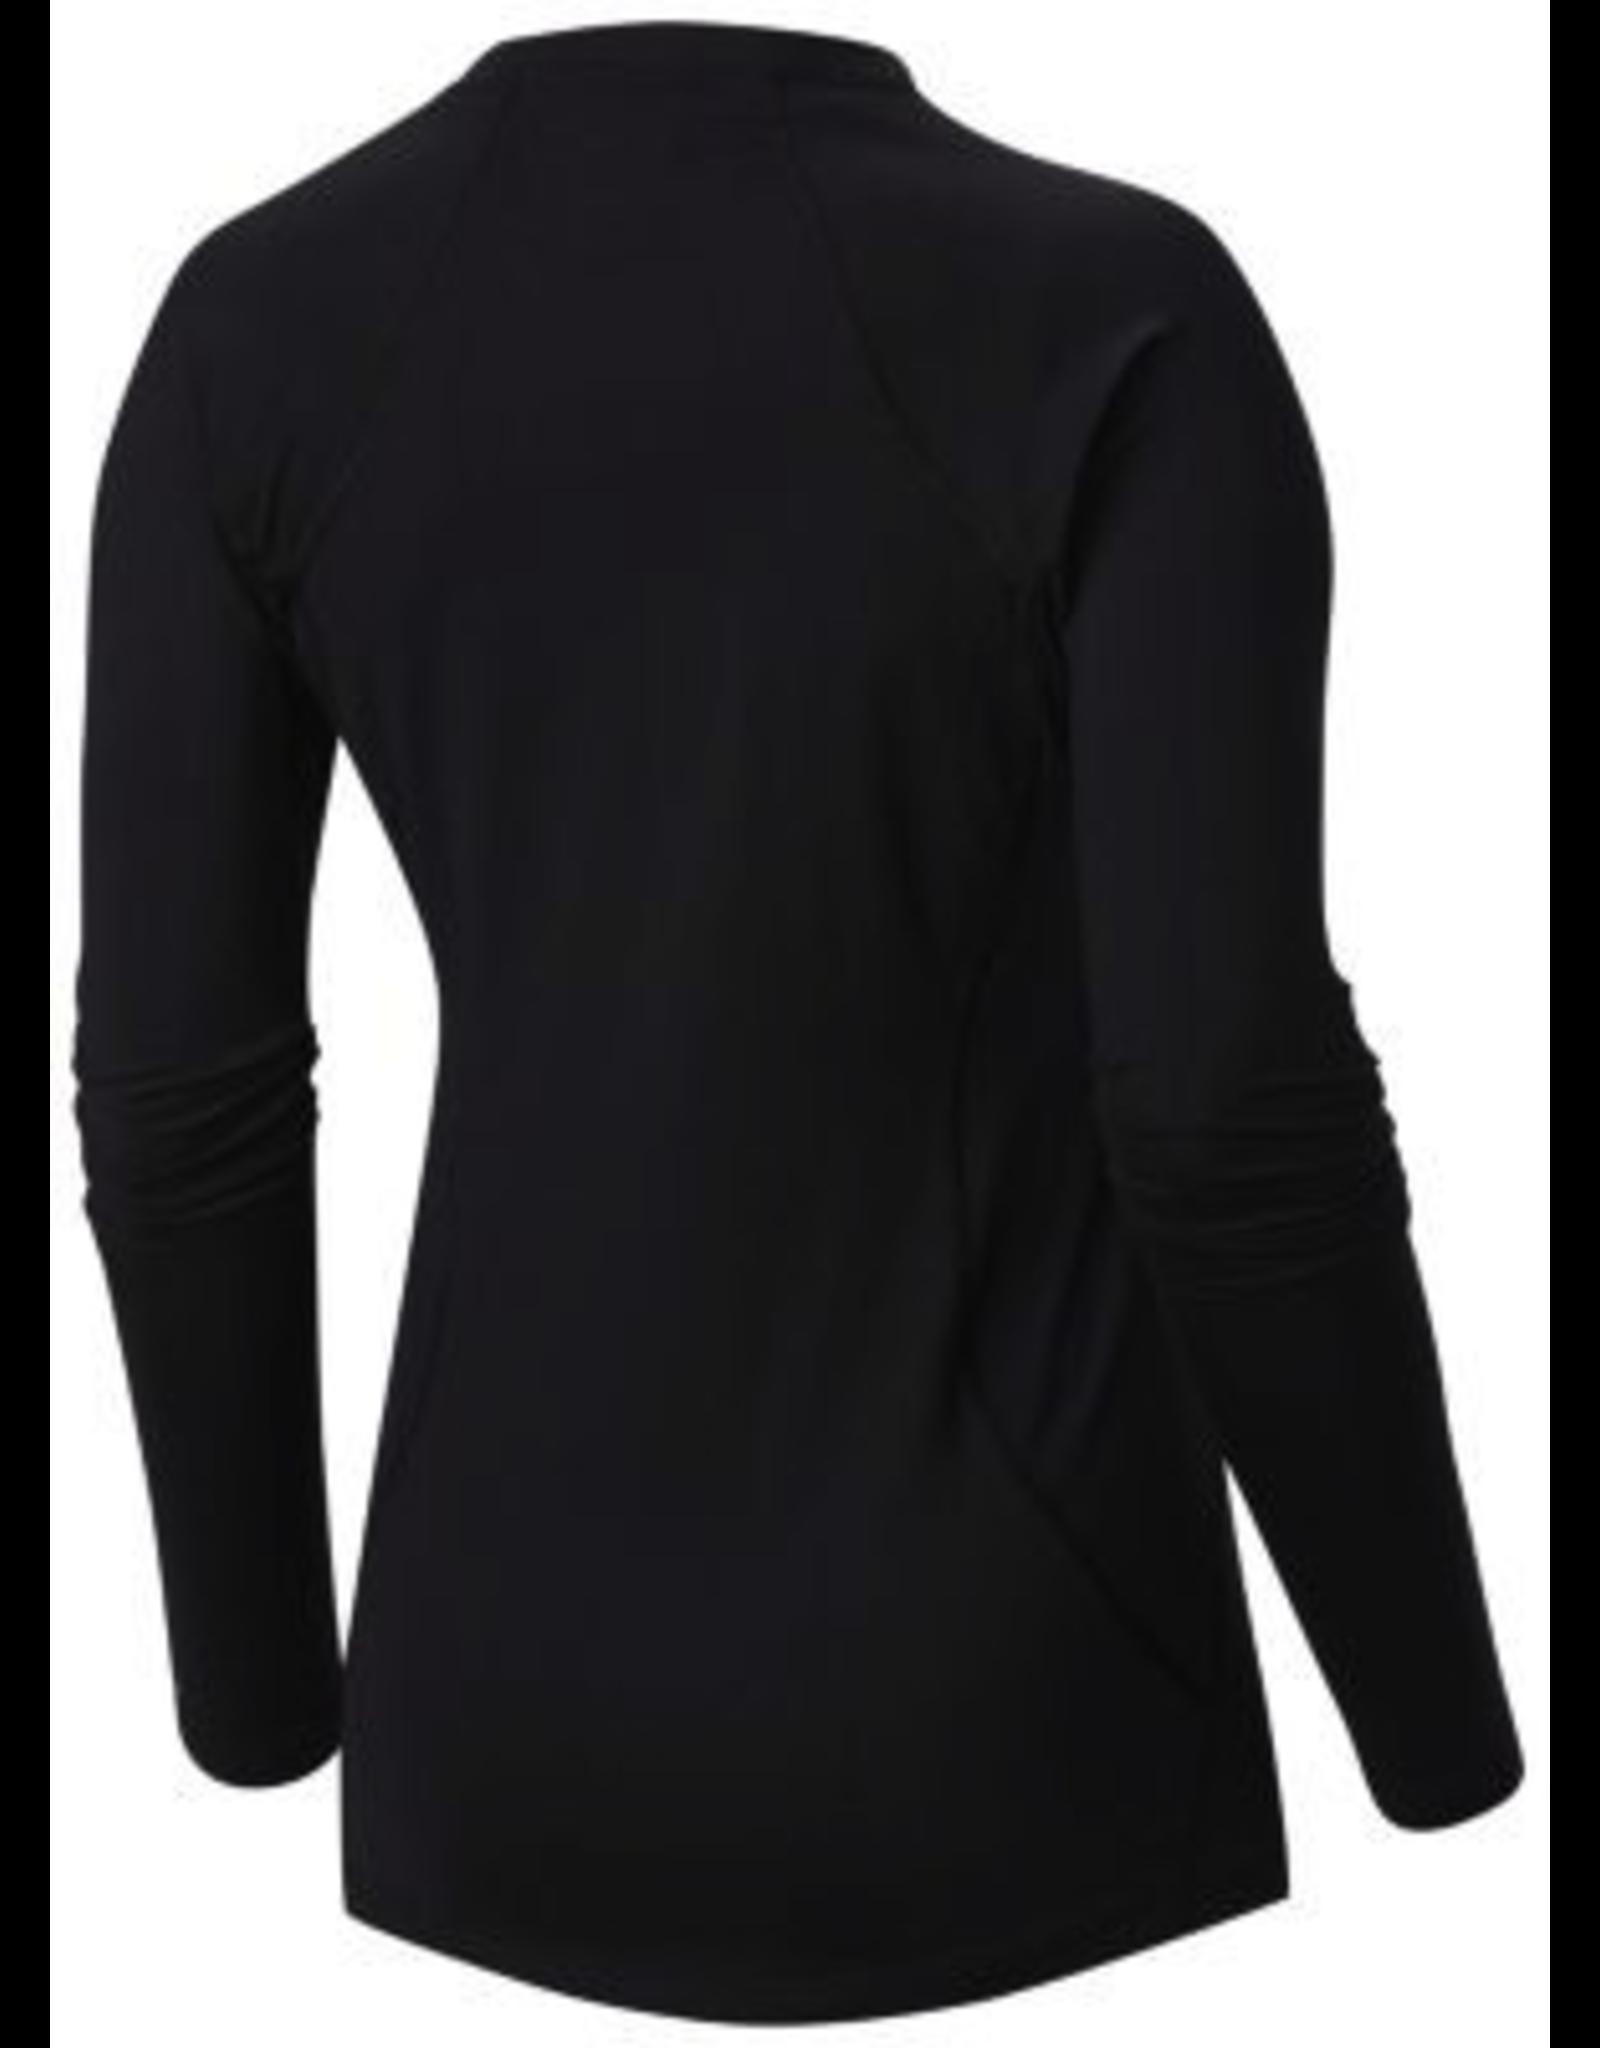 Columbia Columbia Women's Midweight Stretch BaseLayer Long Sleeve Shirt